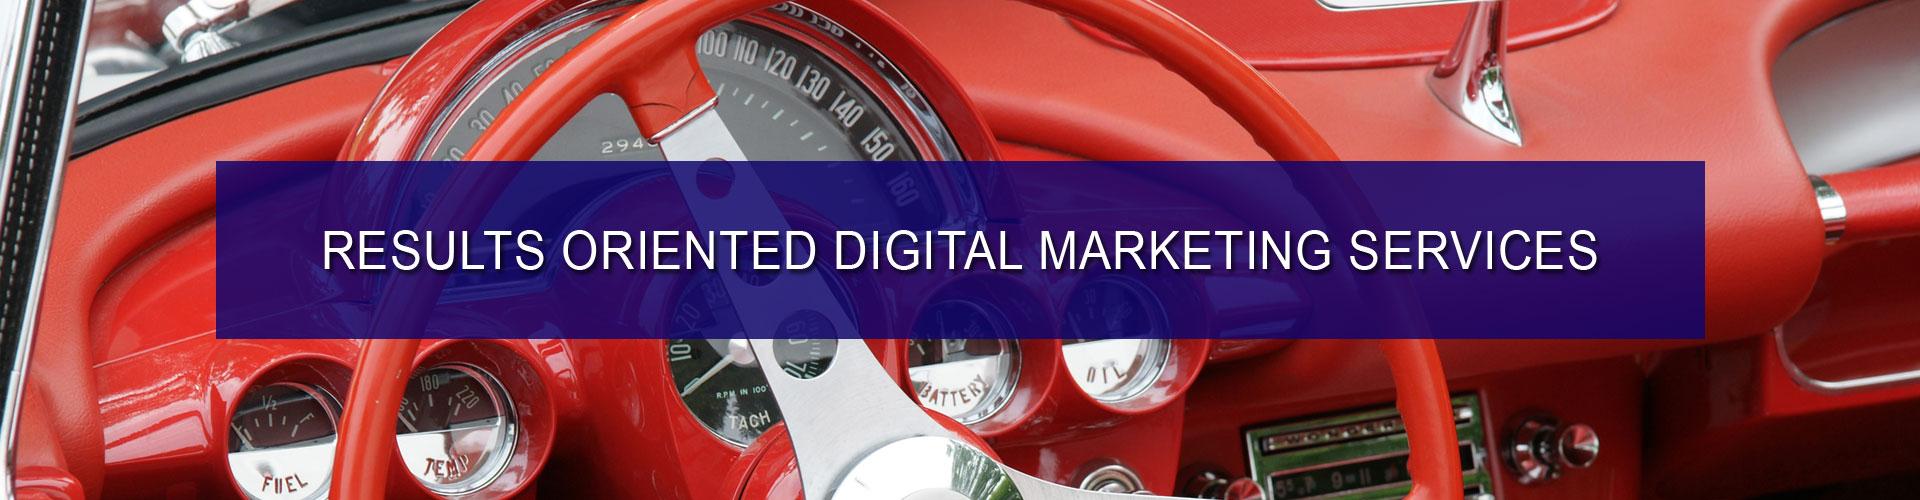 Results Oriented Digital Marketing